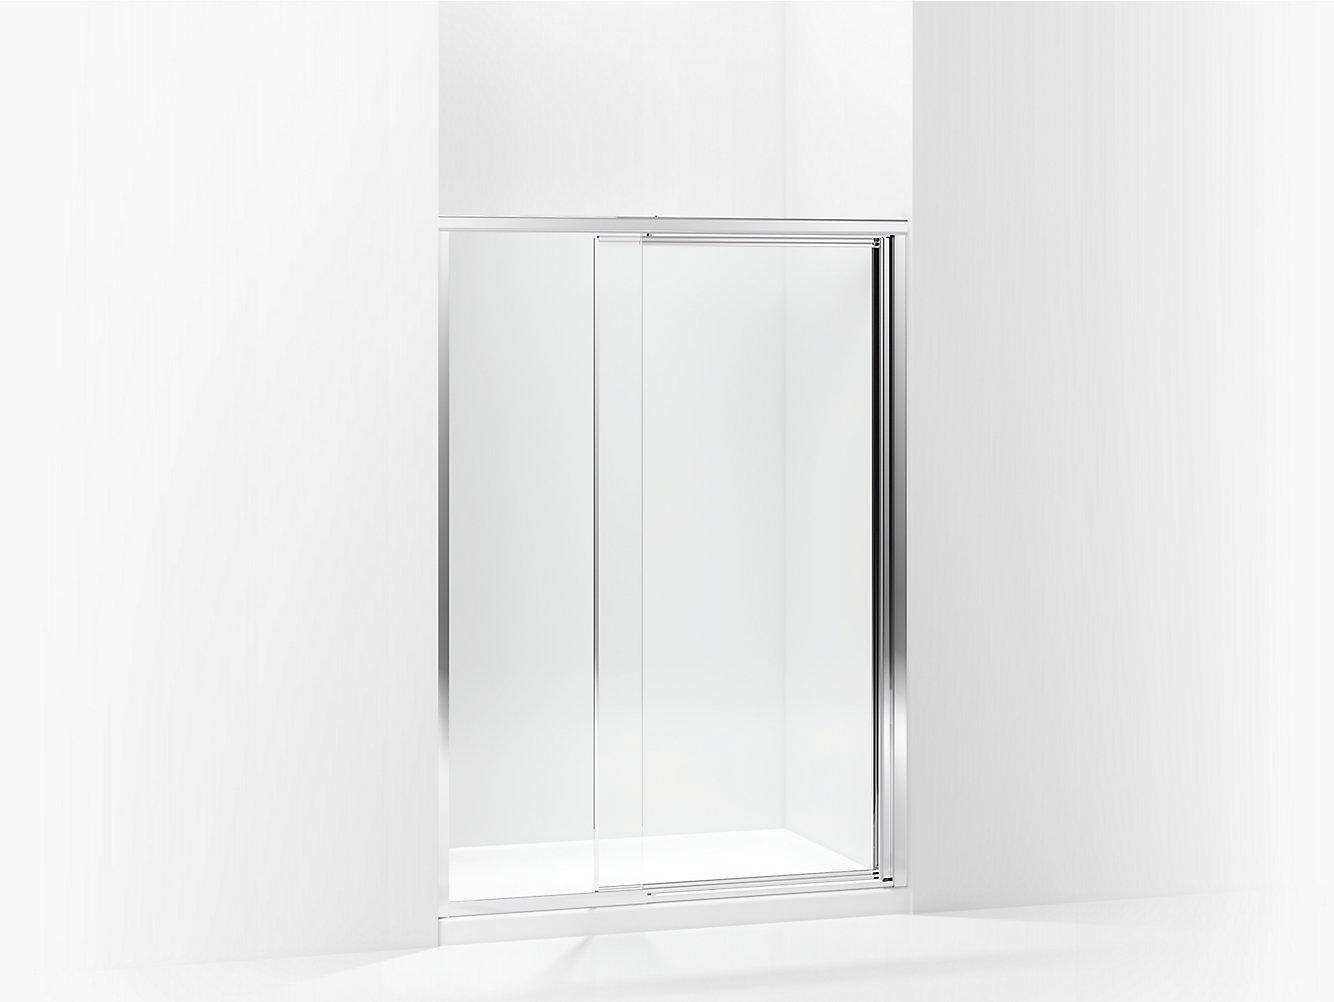 Vista Pivot Framed Swinging Shower Door 4248 W X 65 12 H